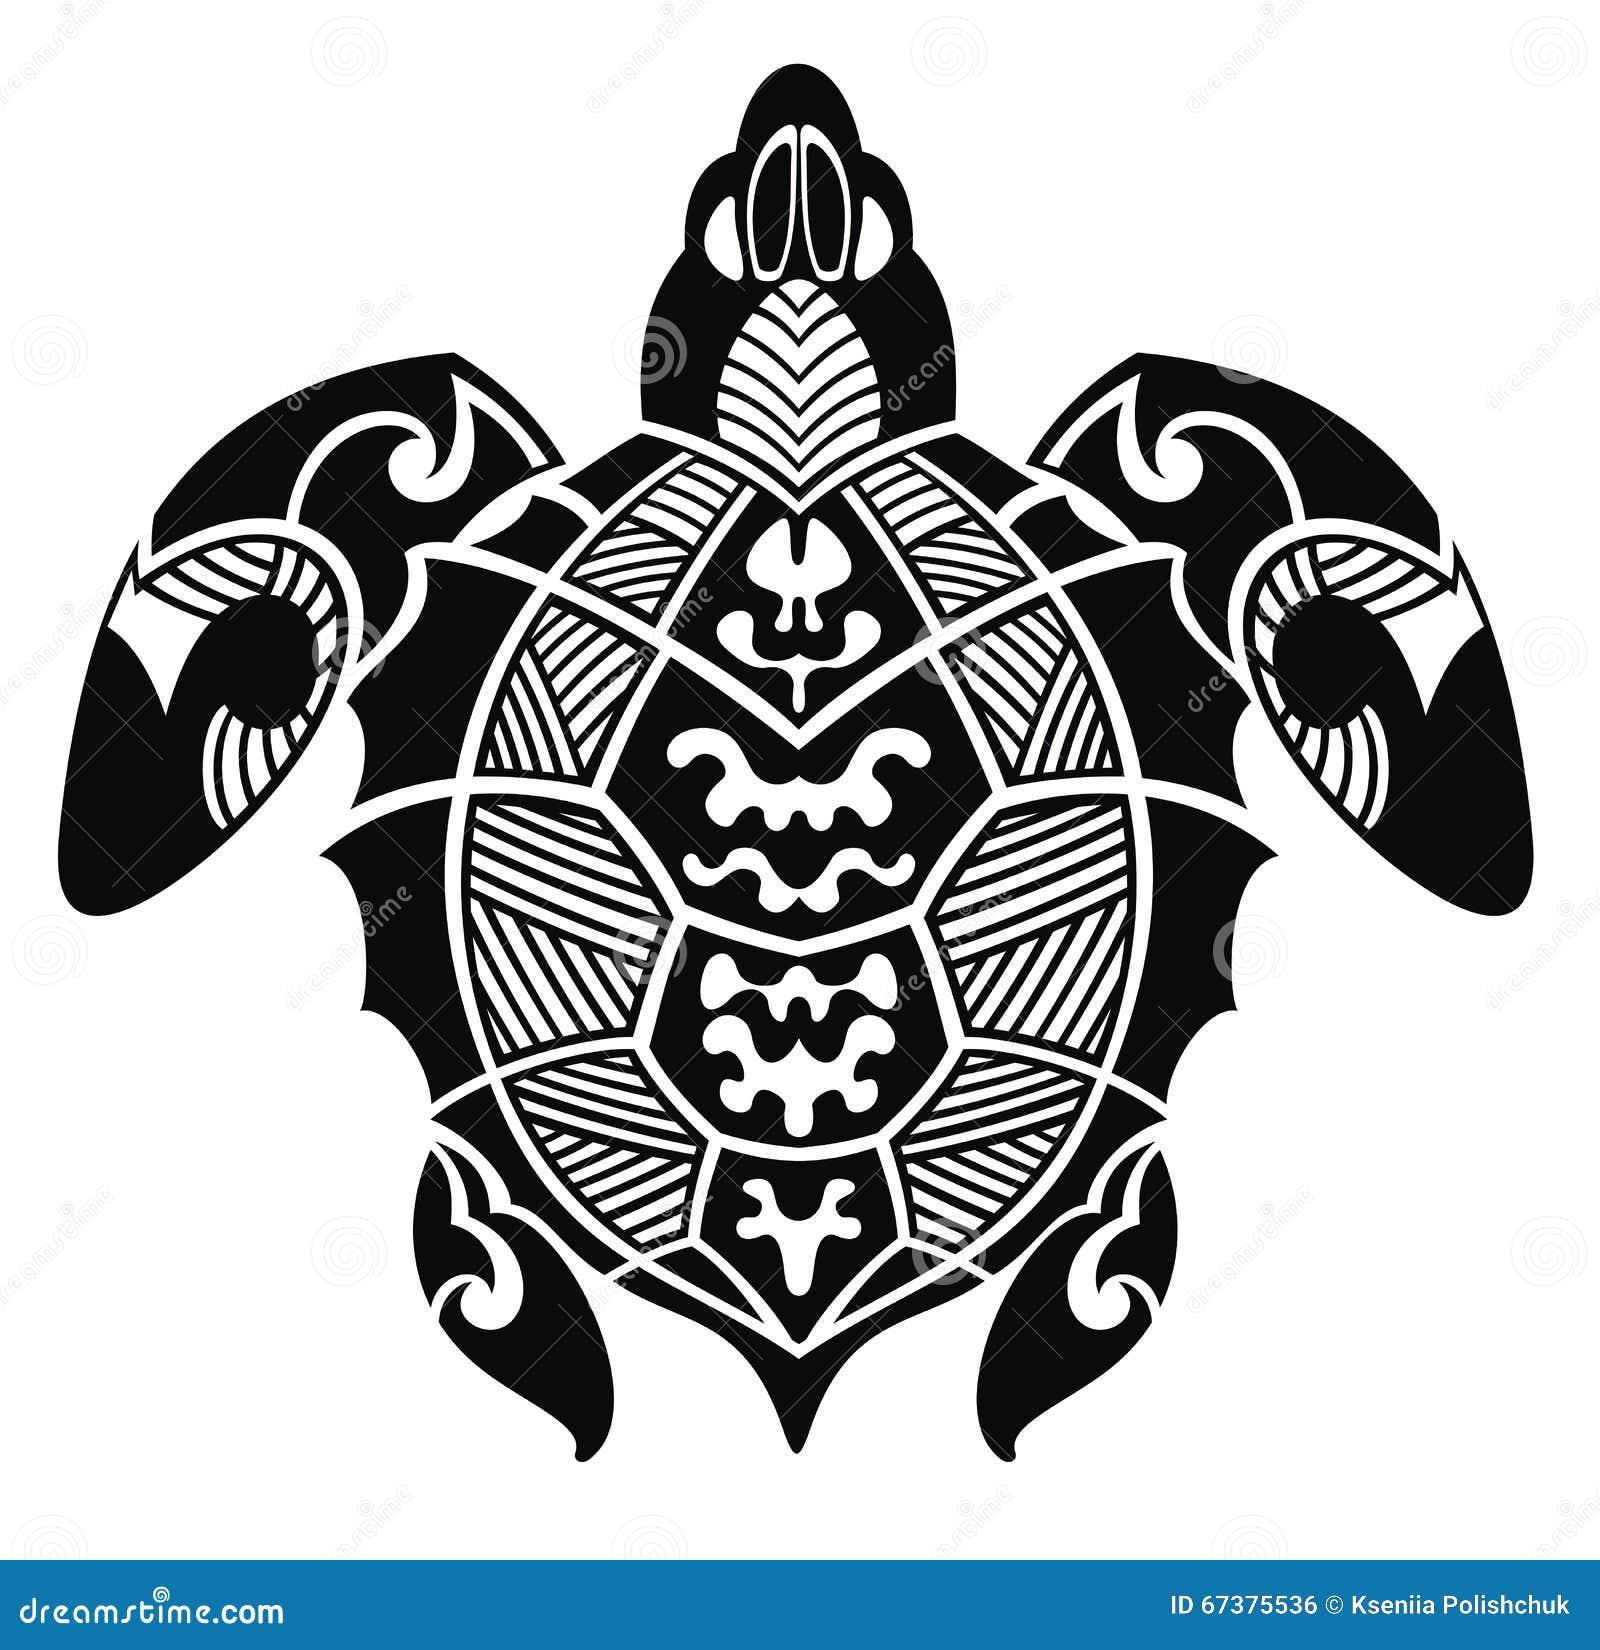 Turtle Tattoo Design Stock Vector Illustration Of Image 67375536